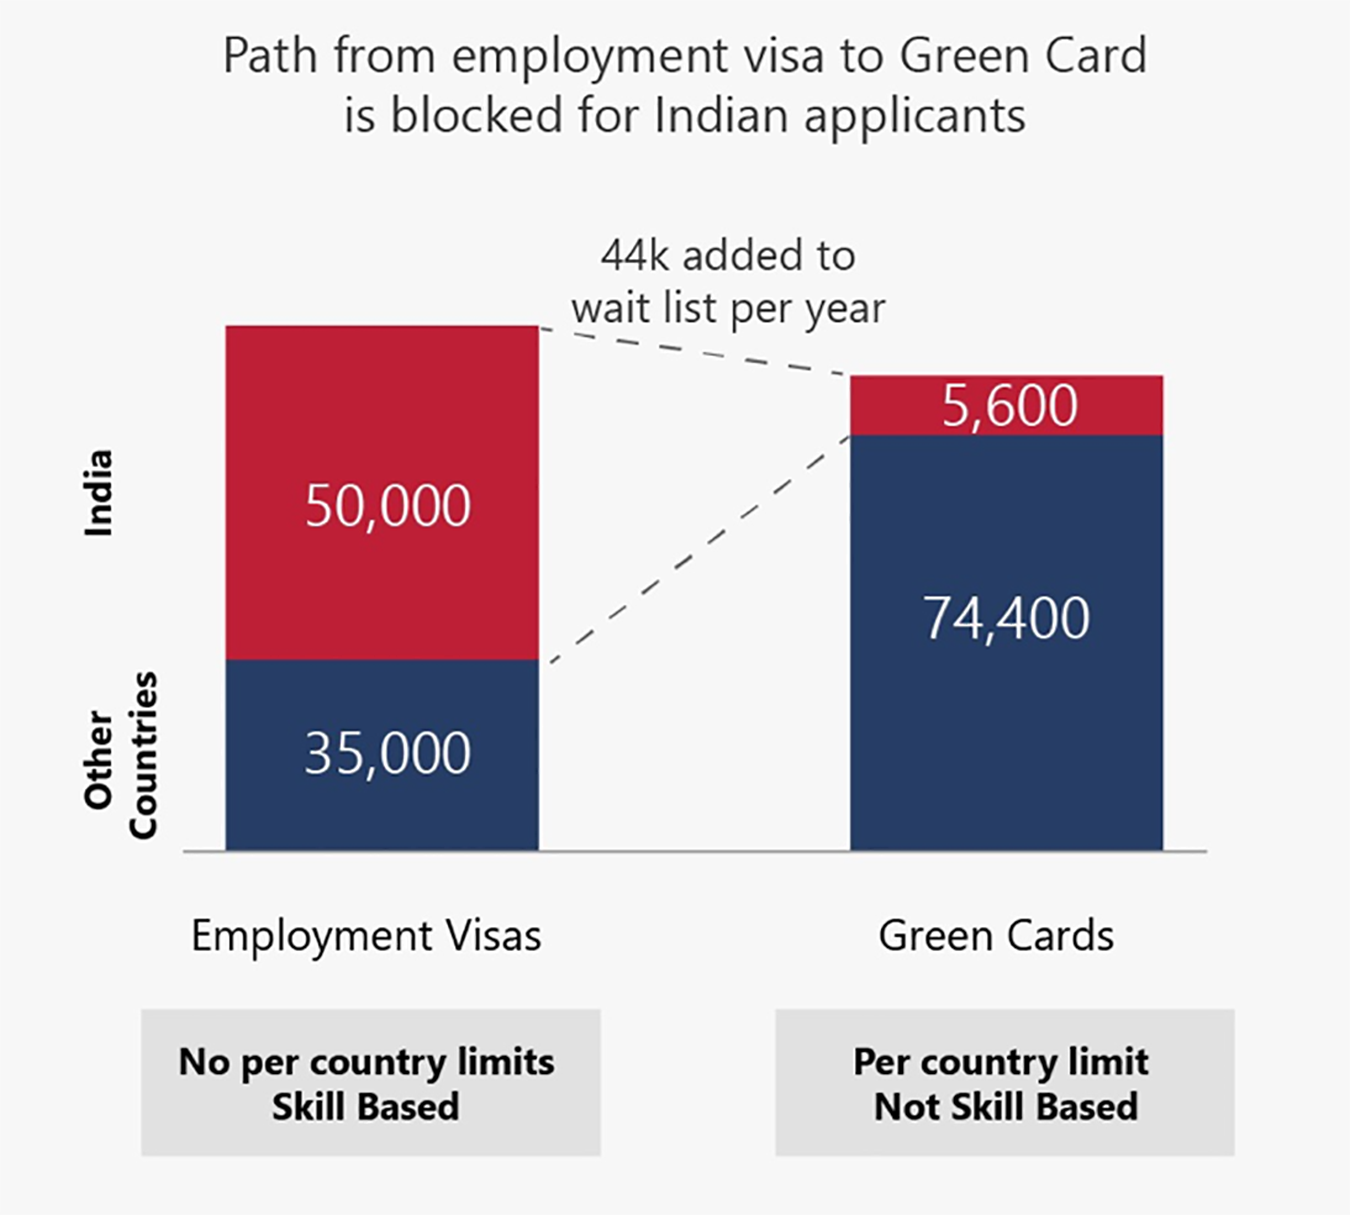 Green Card reform chart. https://www.gcreforms.org/.